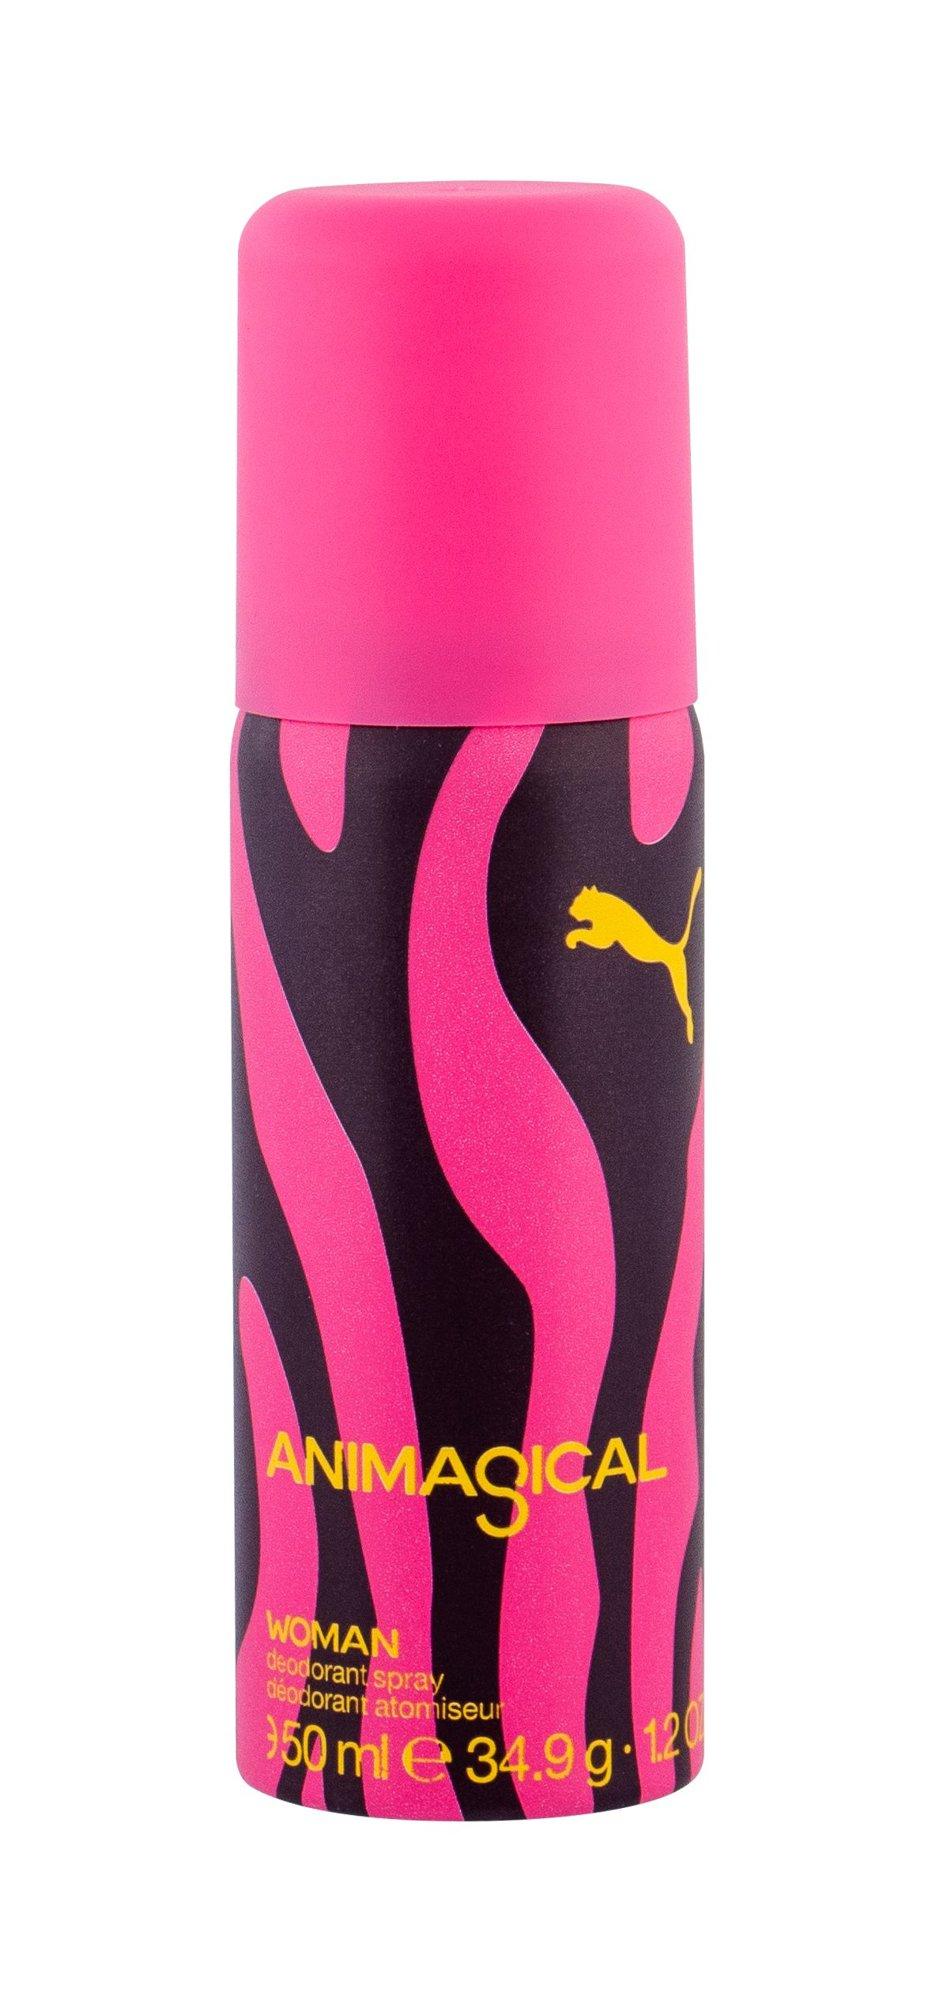 Puma Animagical Woman Deodorant 50ml